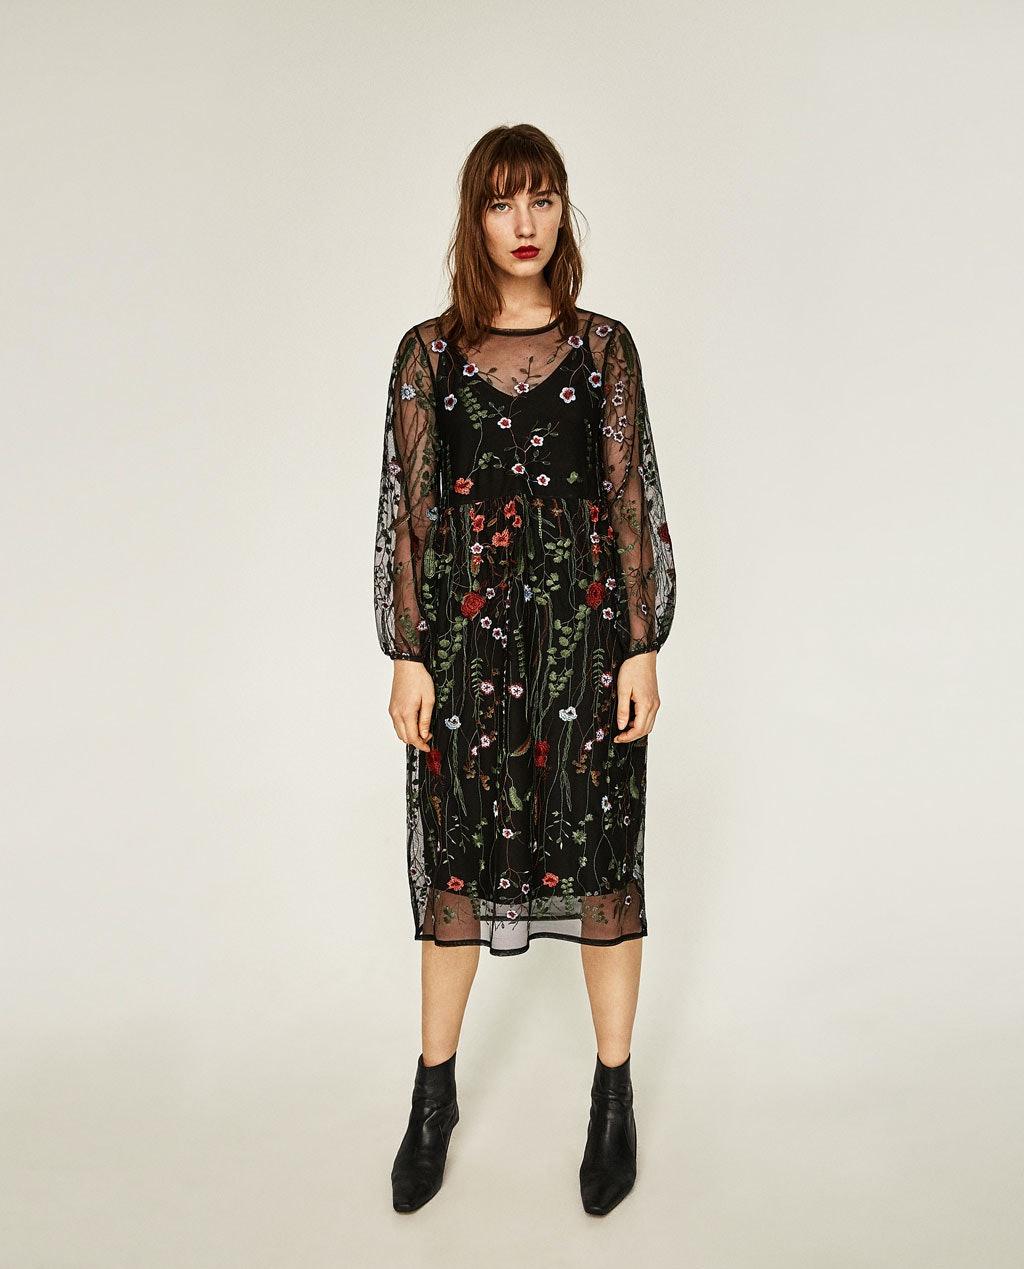 064ecbcbb96c70 13 Zara Items Every Fashion Girl Owns